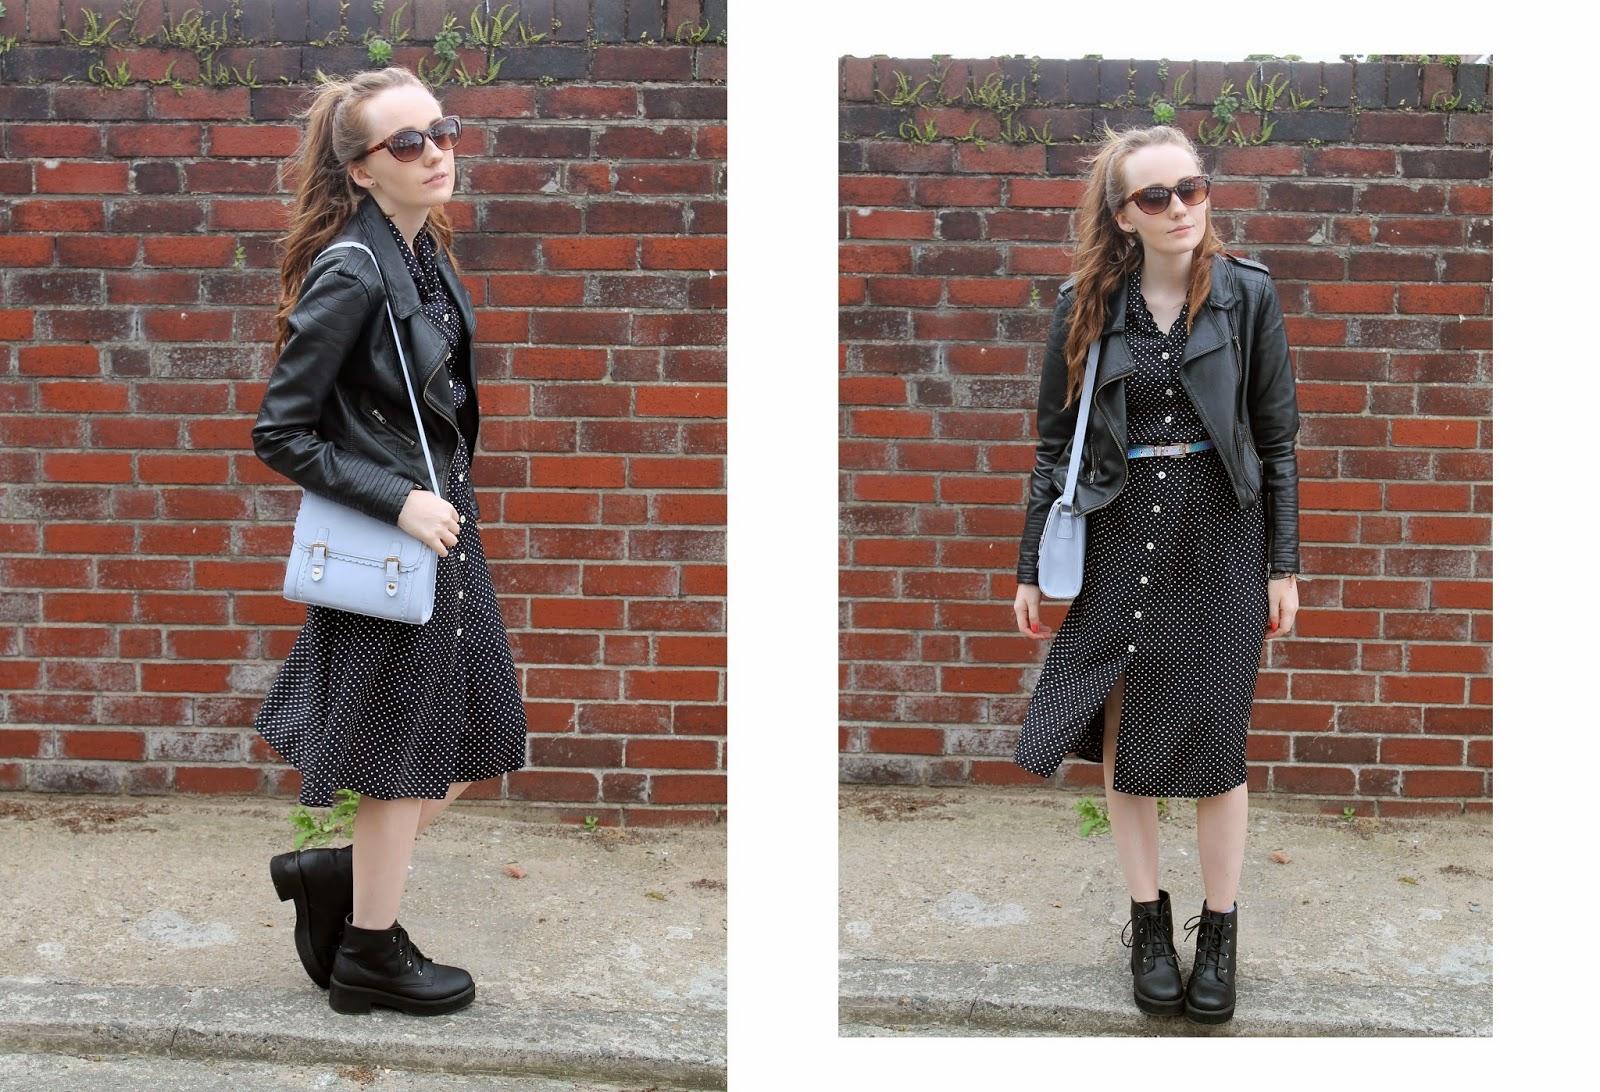 tortoiseshell cateye sunglasses faux leather jacket polka dot button-up vintage midi dress asos scalloped edge satchel asos revolution boots